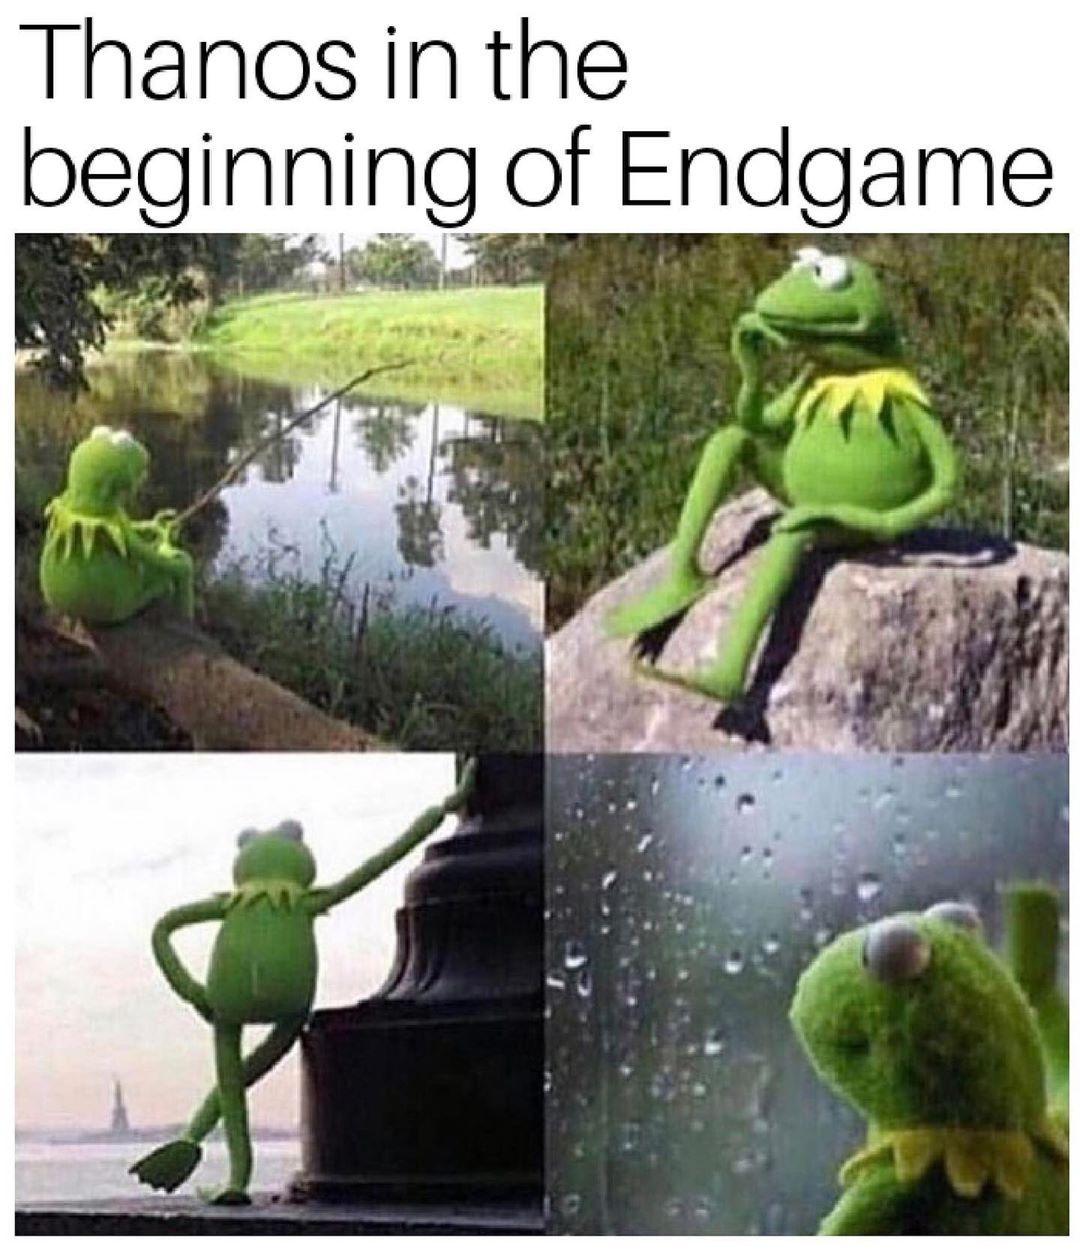 Thanos Memes Endgame Thanos Thanosmemes Memes Infinitywar Marvel Marvelmovies Thanosfunny Thanosdank Thanossnap T Friendship Memes Memes Friend Memes